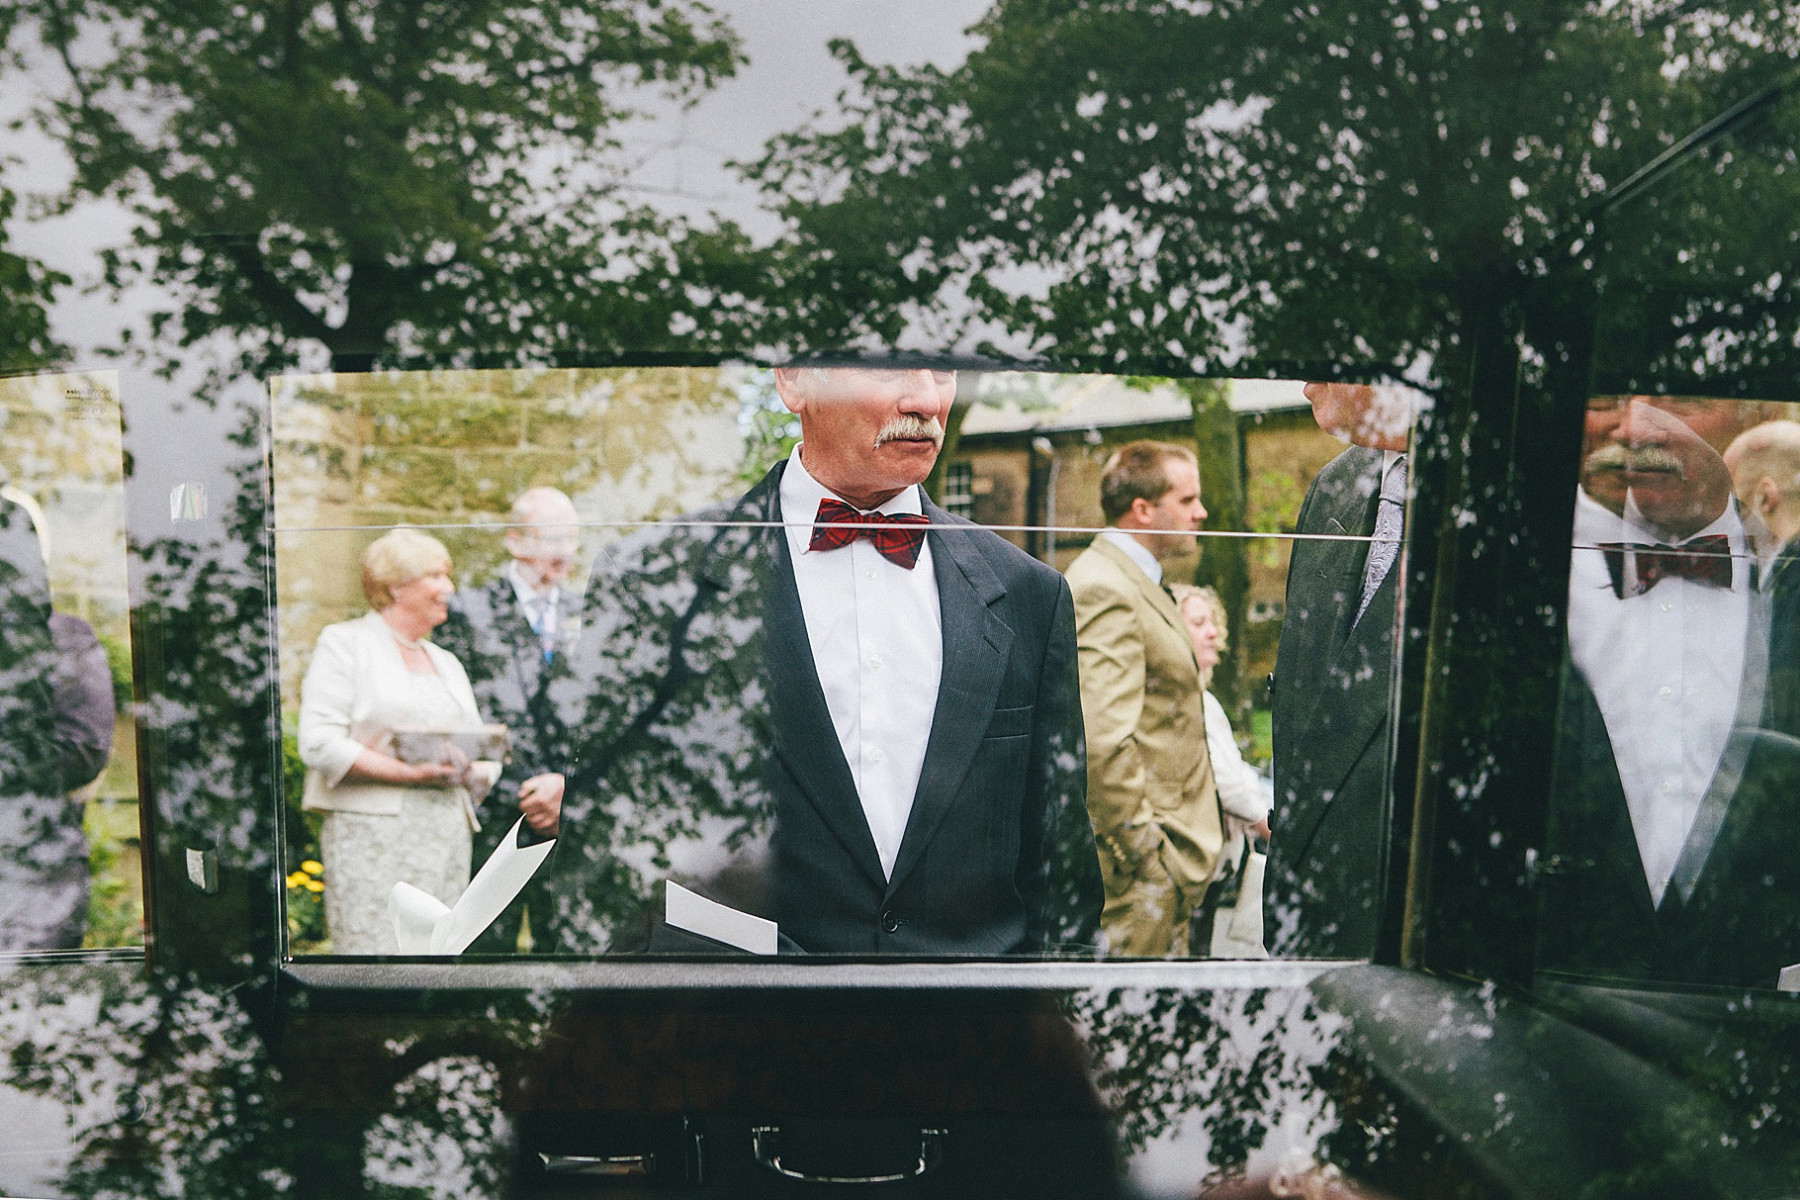 the_twins_wedding_photographers_bowtie1-1800x1200.jpg